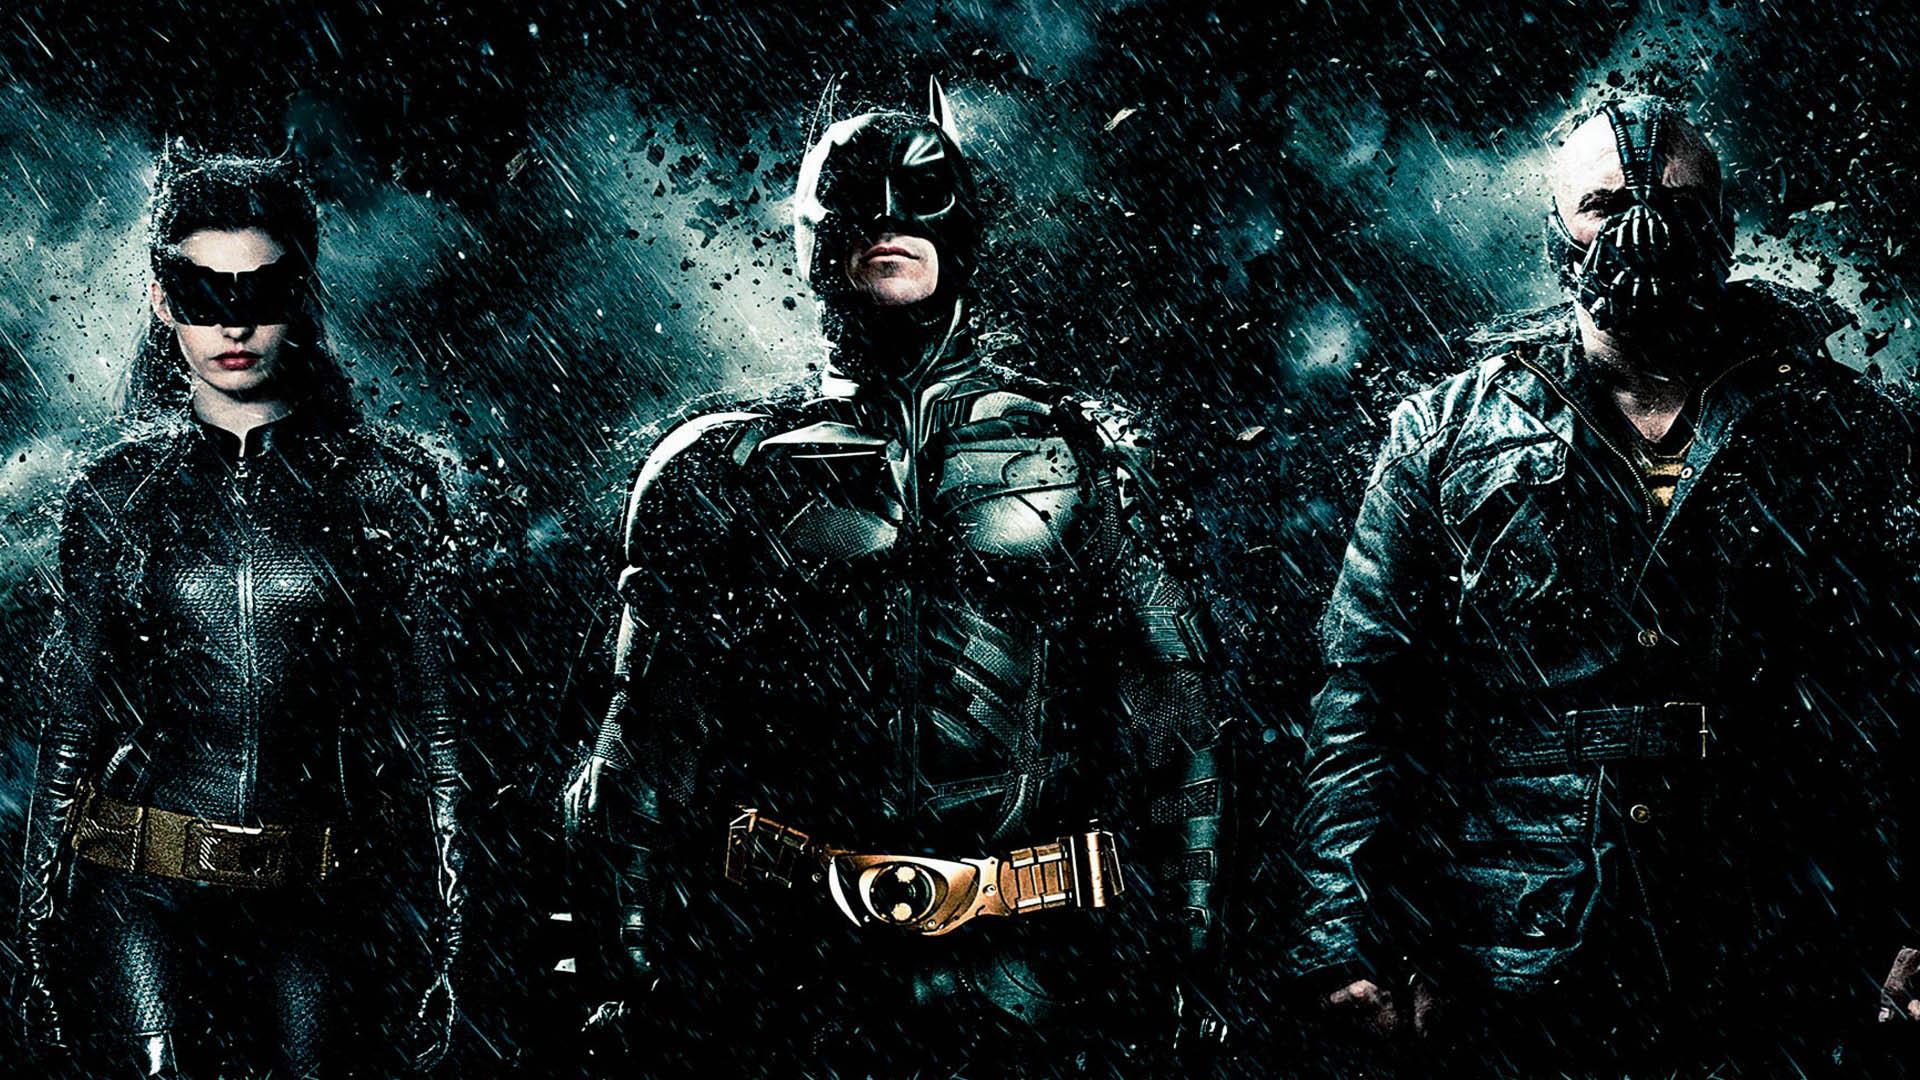 batman desktop background 1920x1080